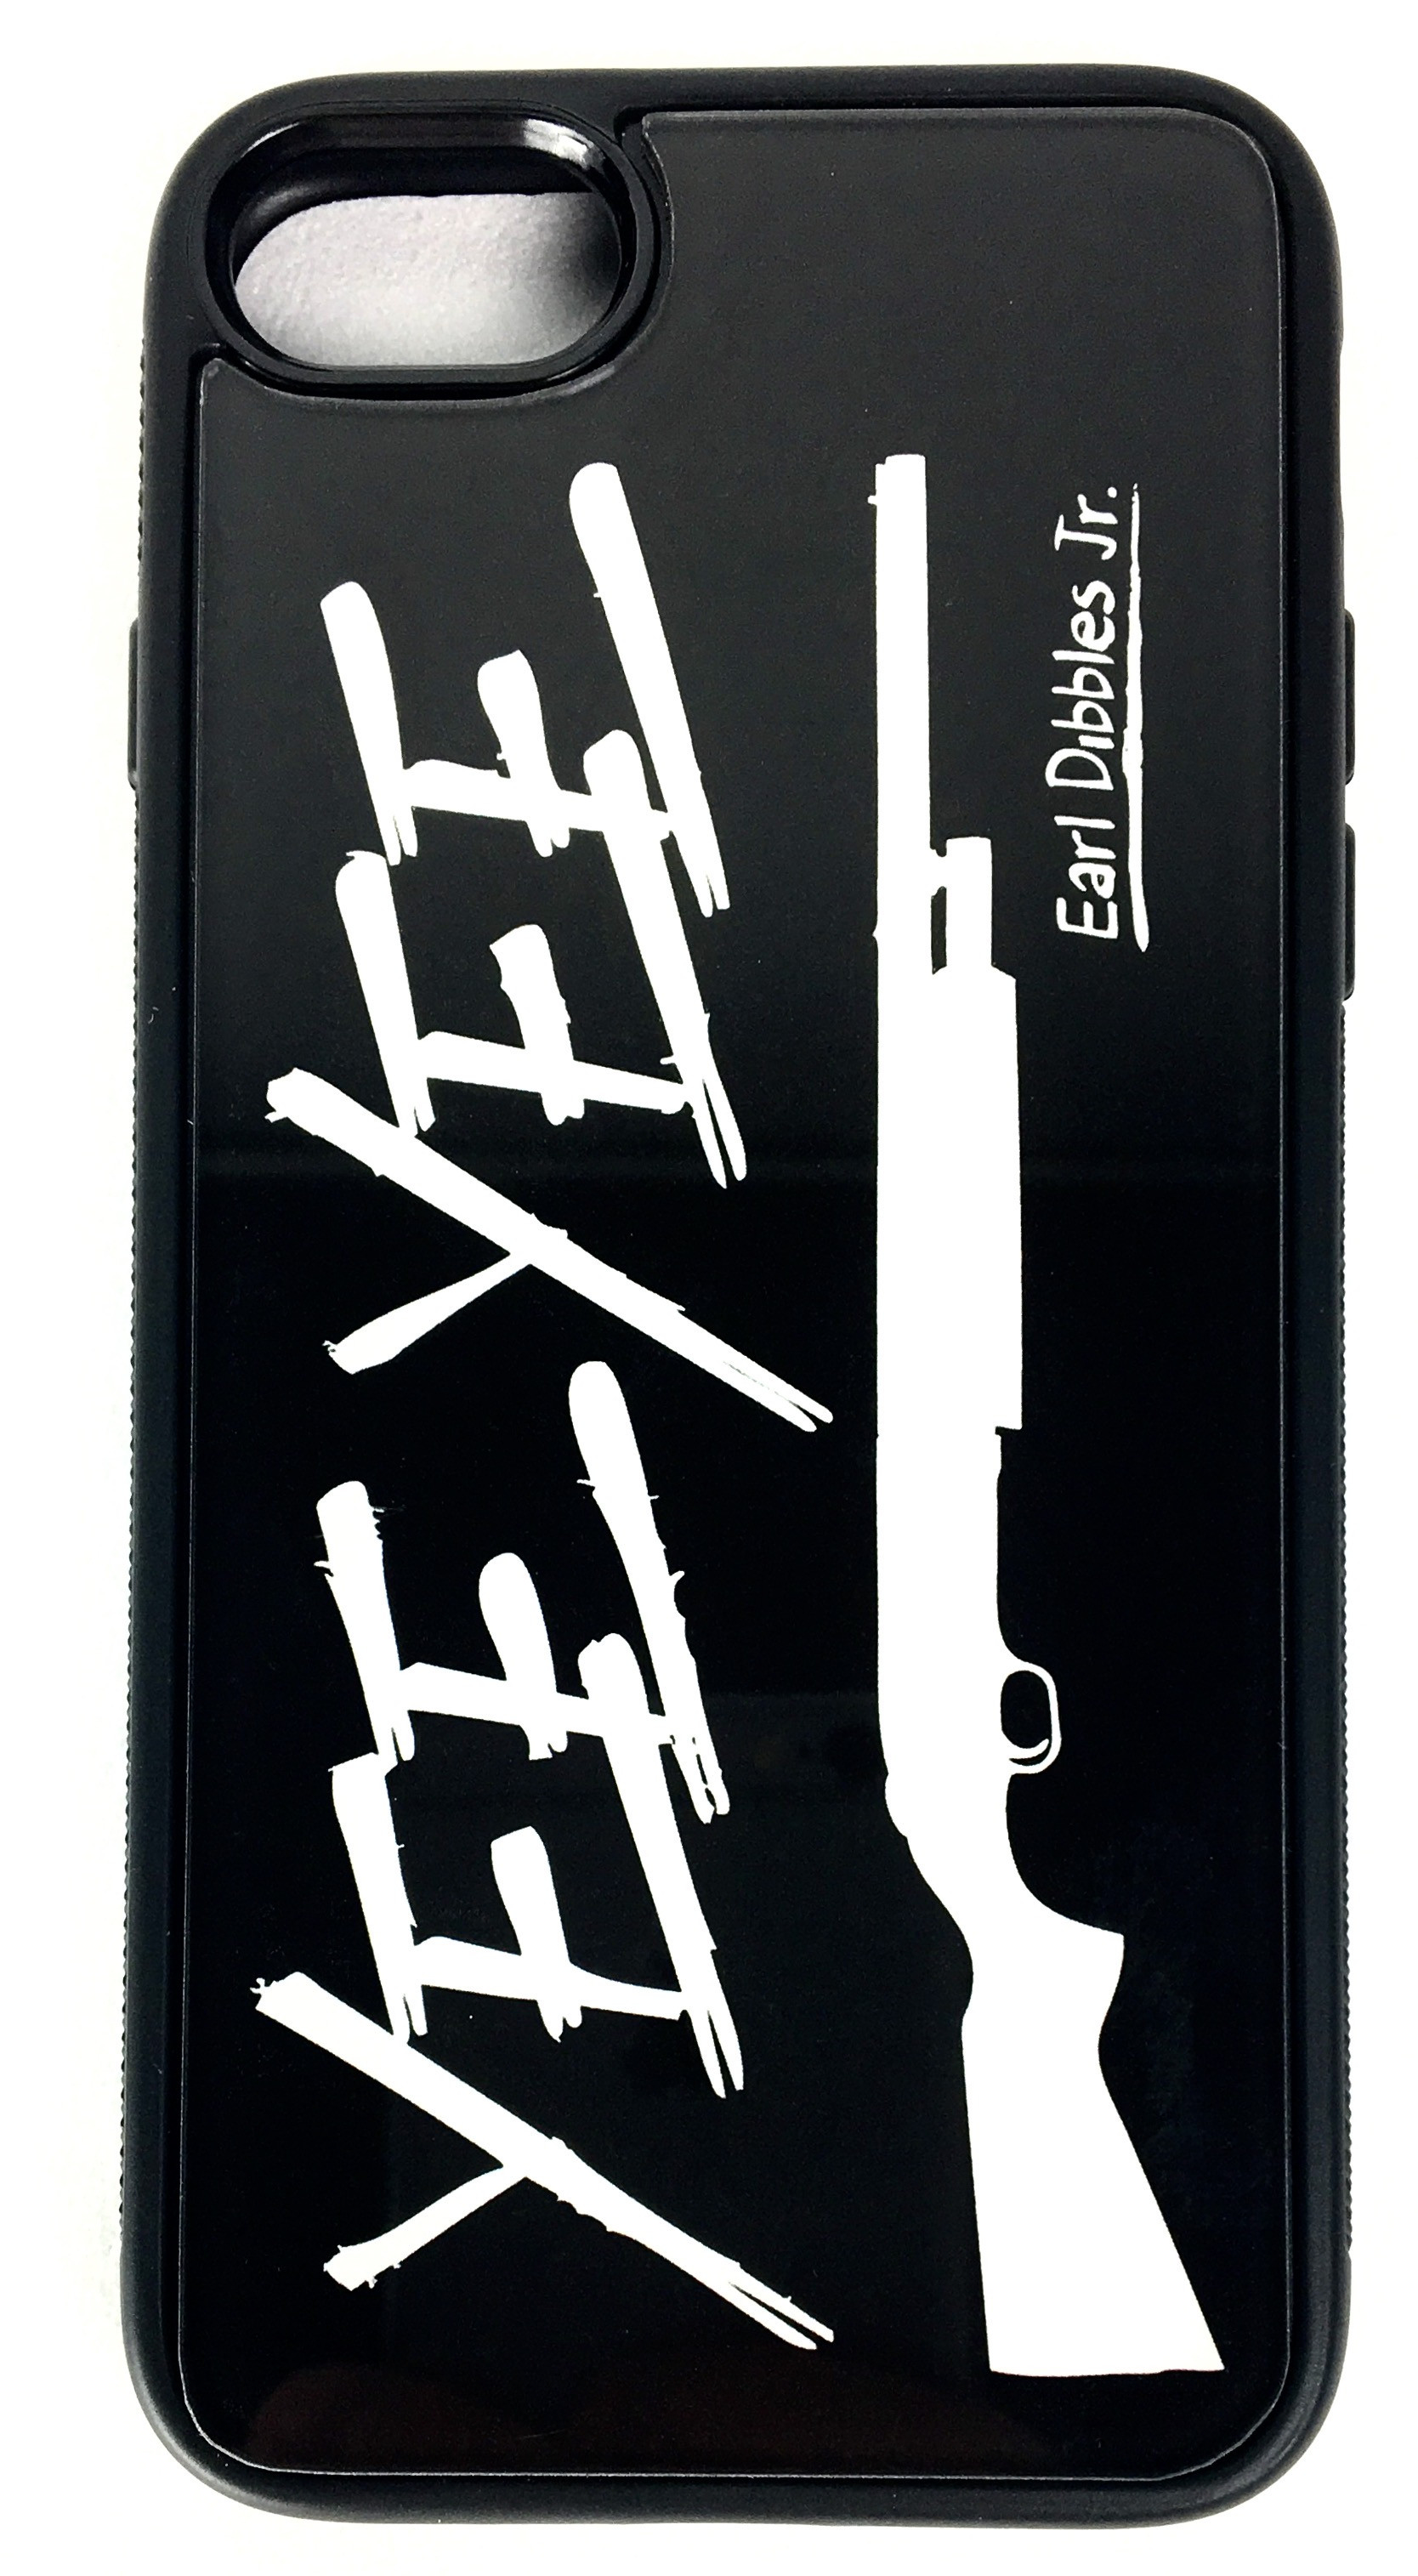 Yee Yee Iphone 78 Case  Granger Smith Store